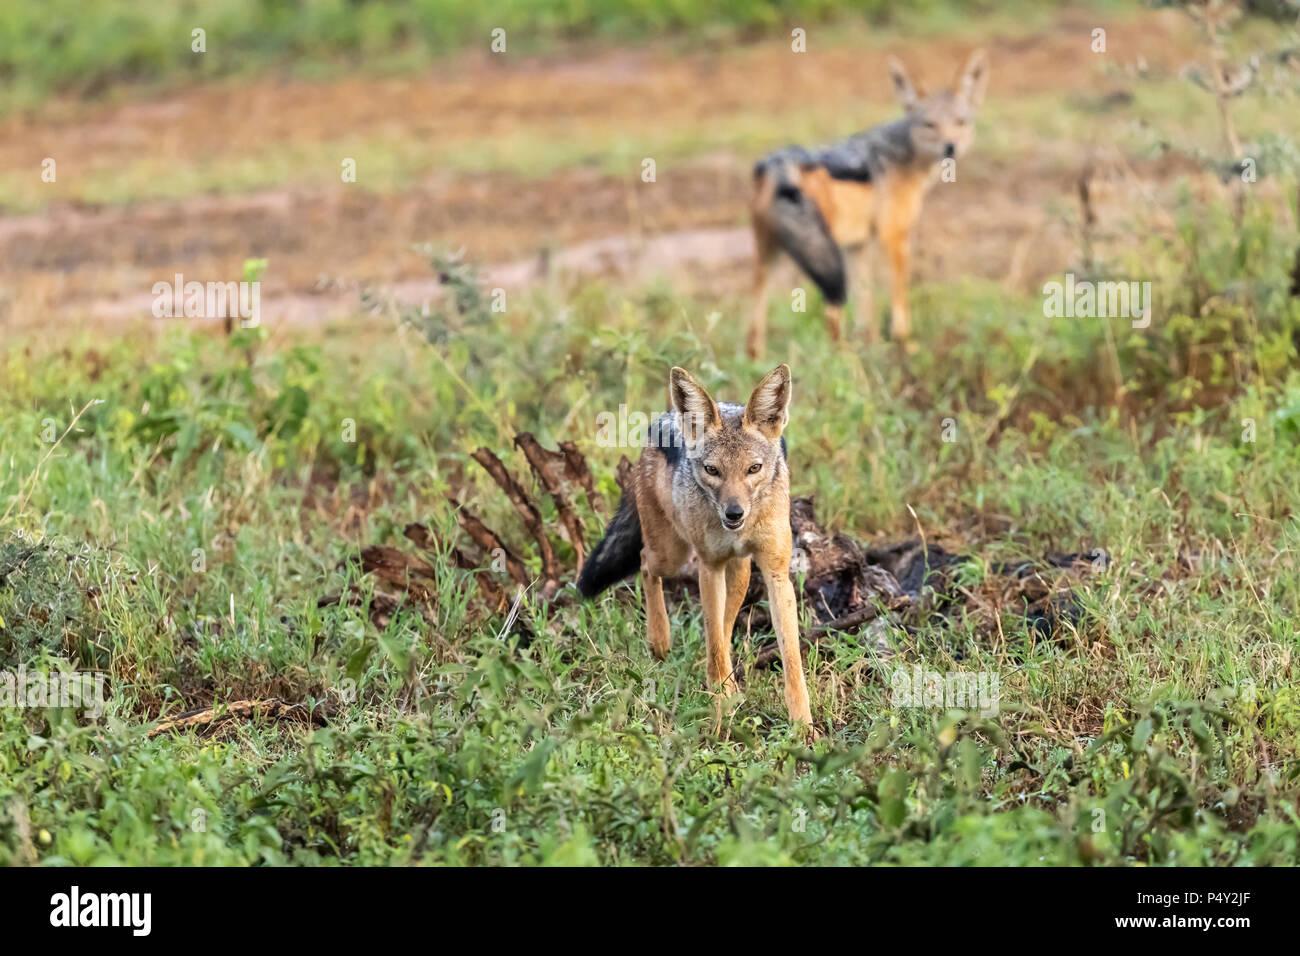 Black-backed Jackal (Canis mesomelas) protecting a carcus in Serengeti National Park, Tanzania - Stock Image